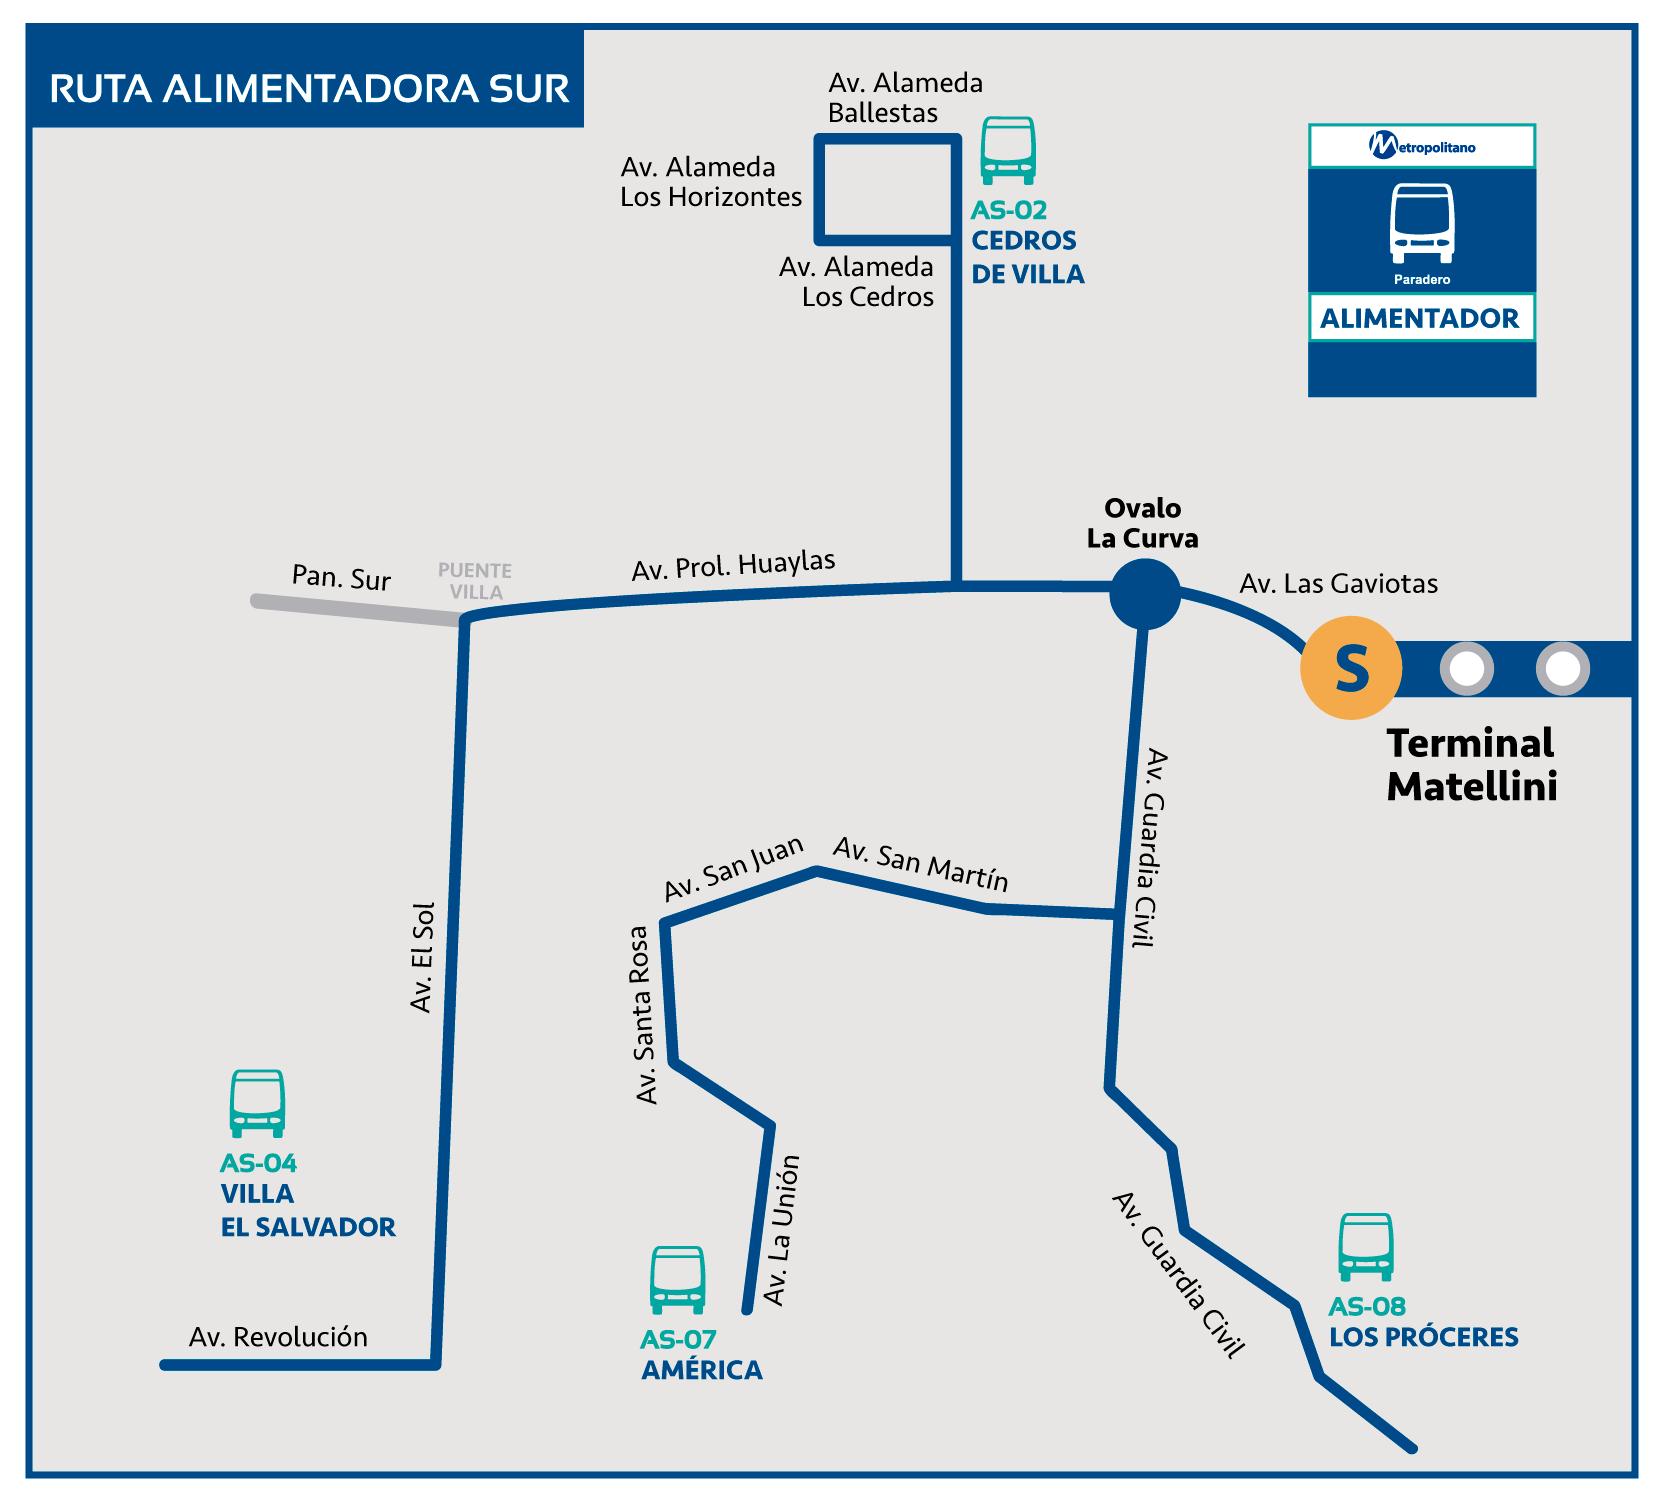 RUTA-ALIMENTADORA-SUR